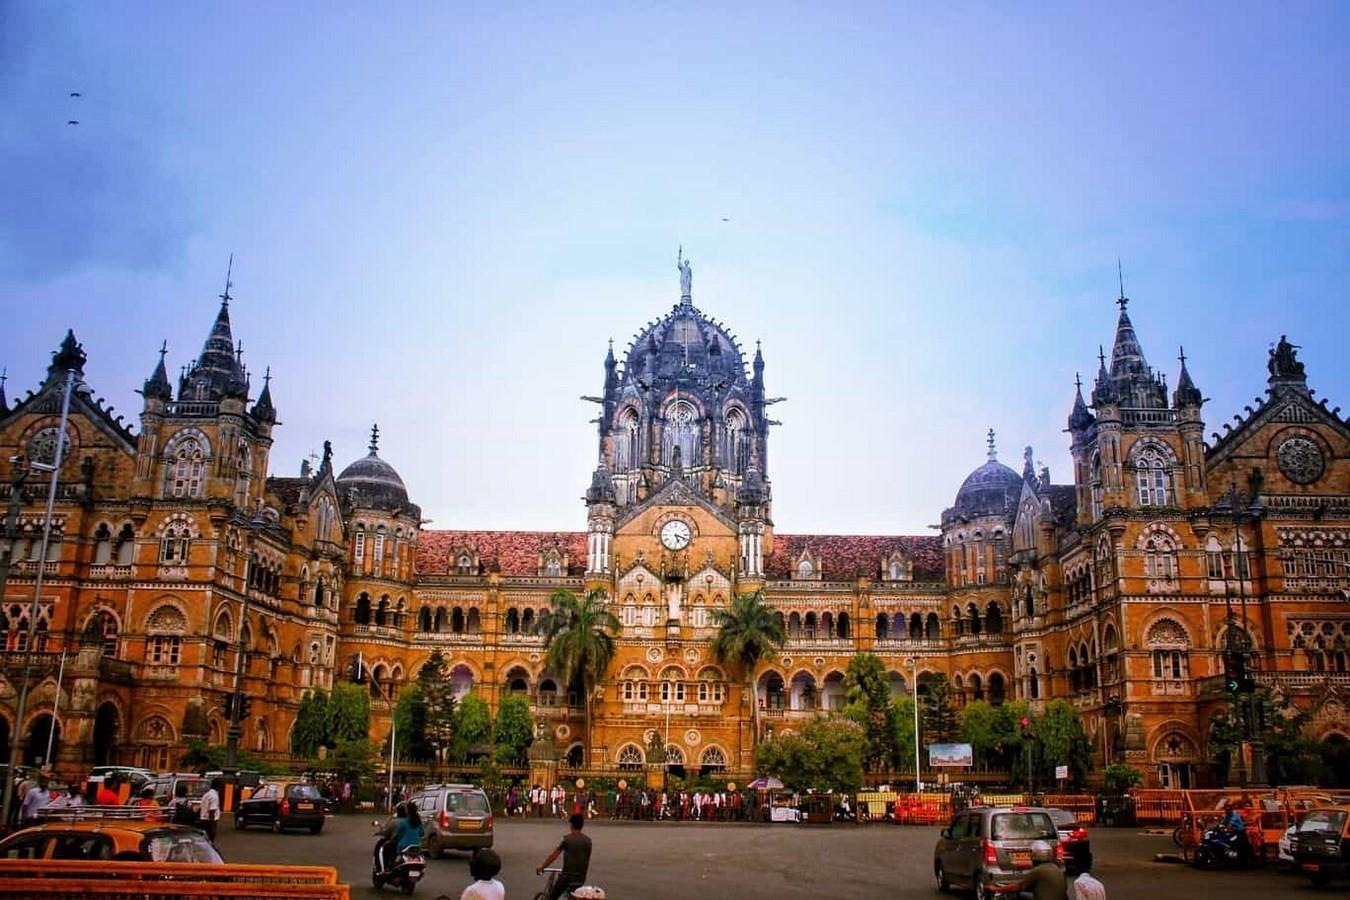 Chhatrapati Shivaji Maharaj Terminus, Maharashtra - Sheet2